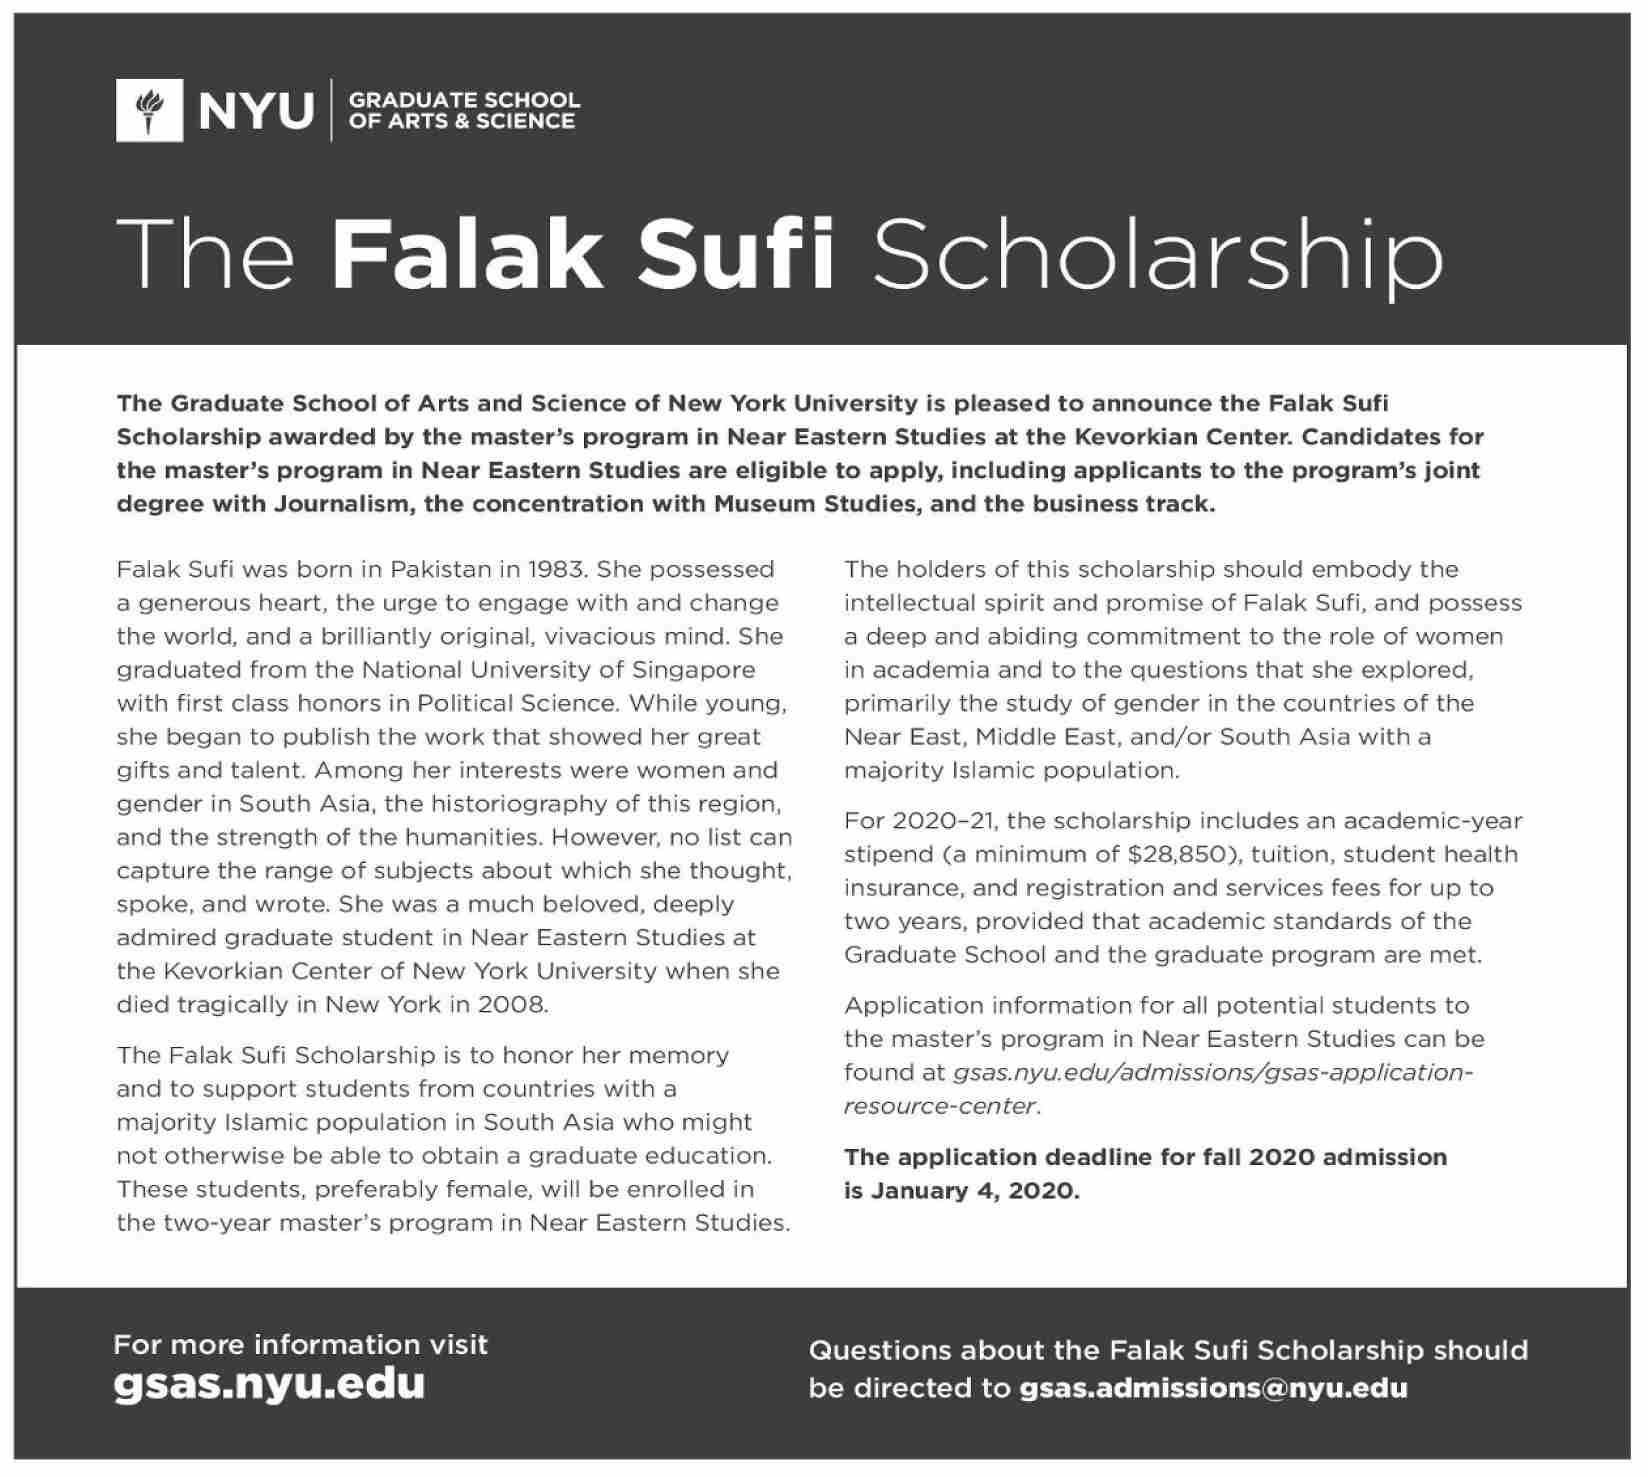 The Falak Sufi Scholarship at NYU Graduate School Of Arts & Science (Master's Program)